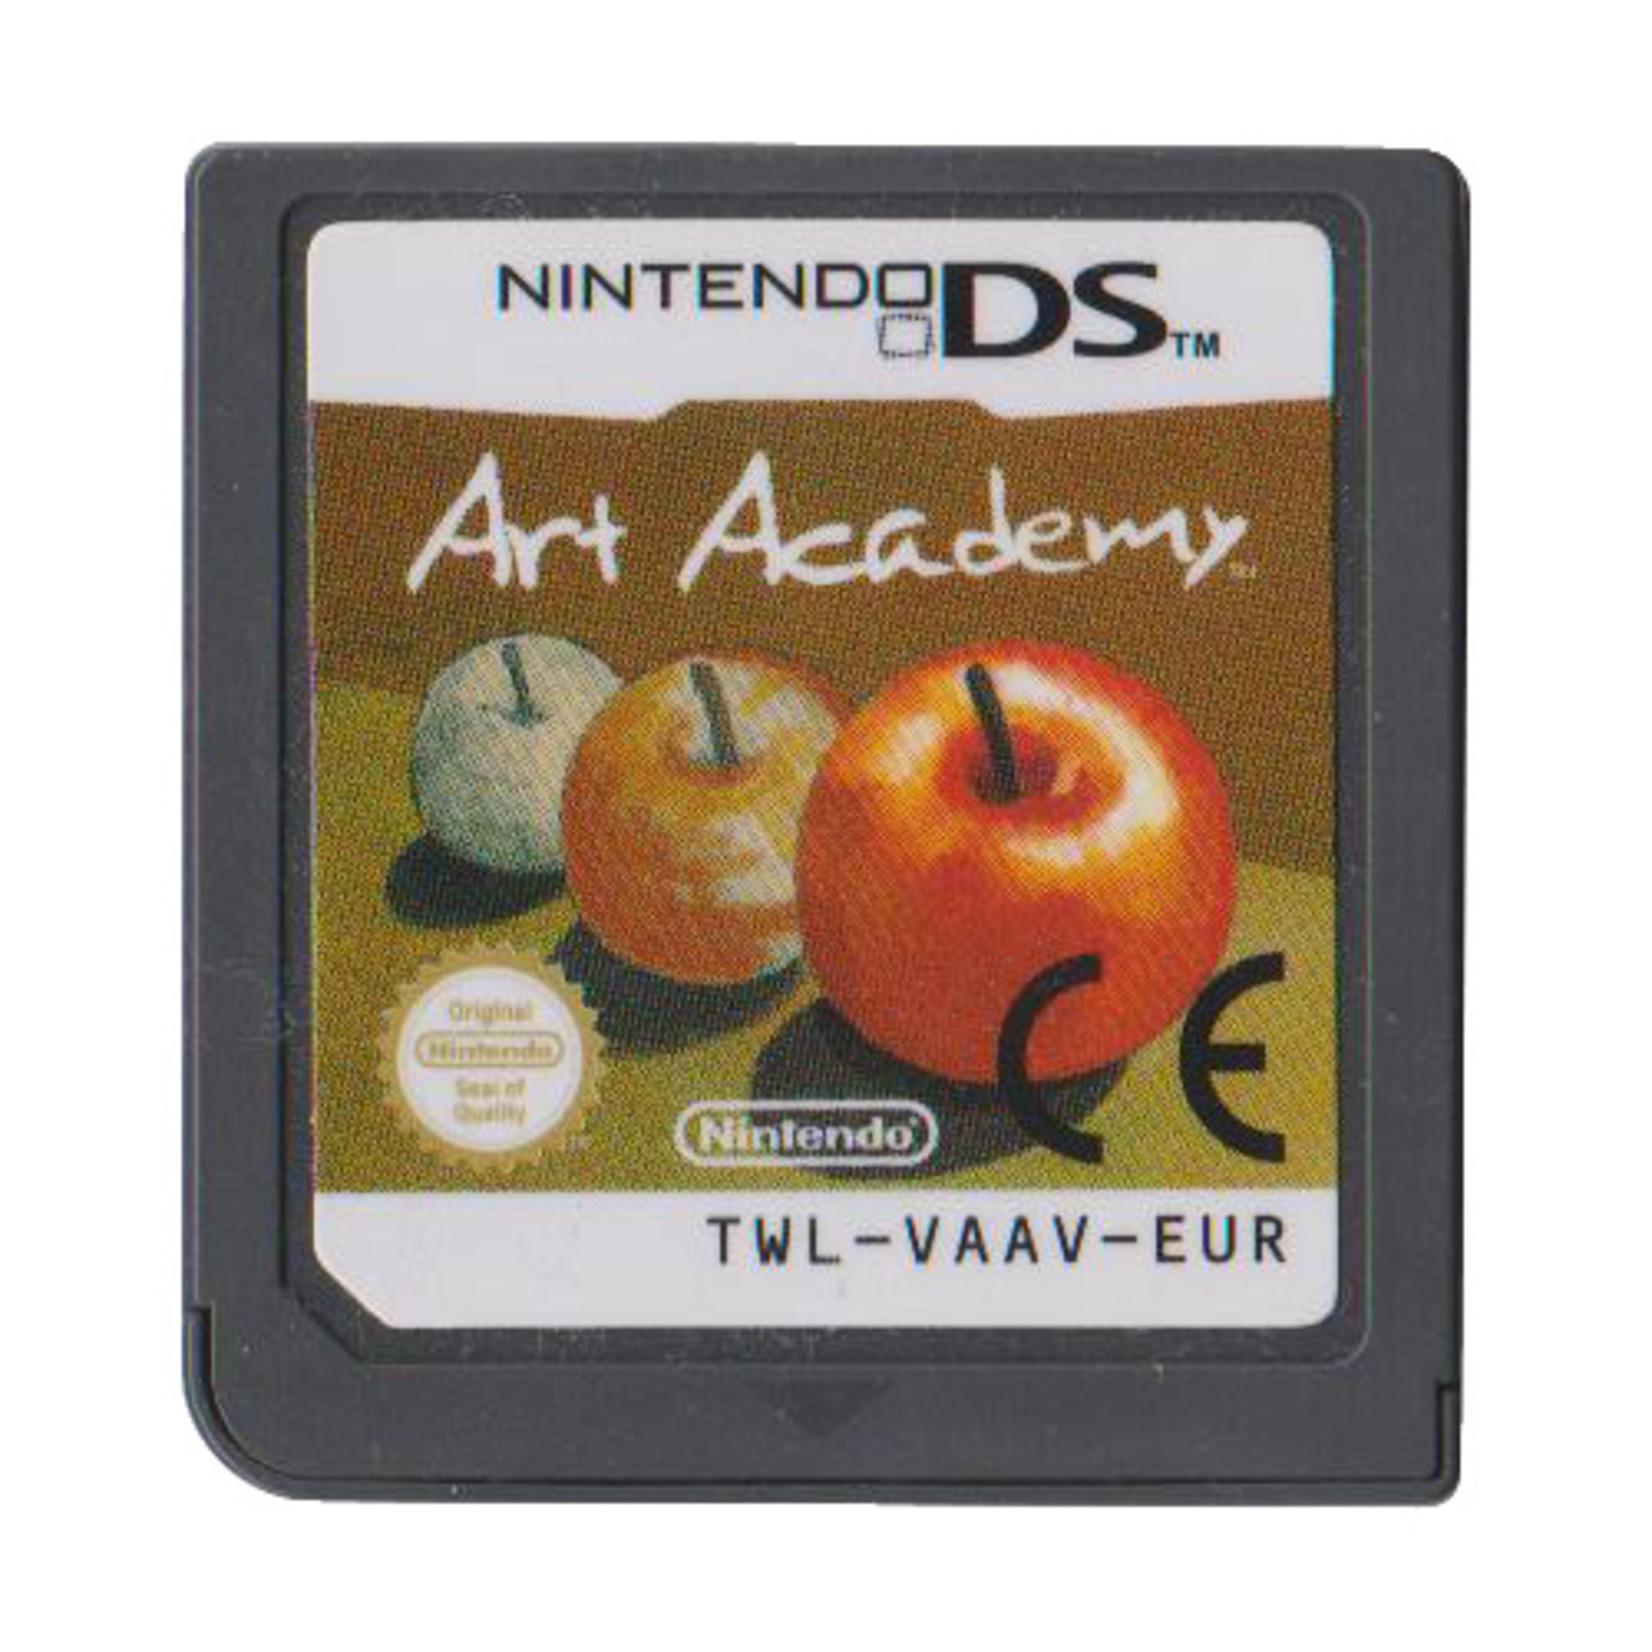 Art Academy (Losse Cassette)